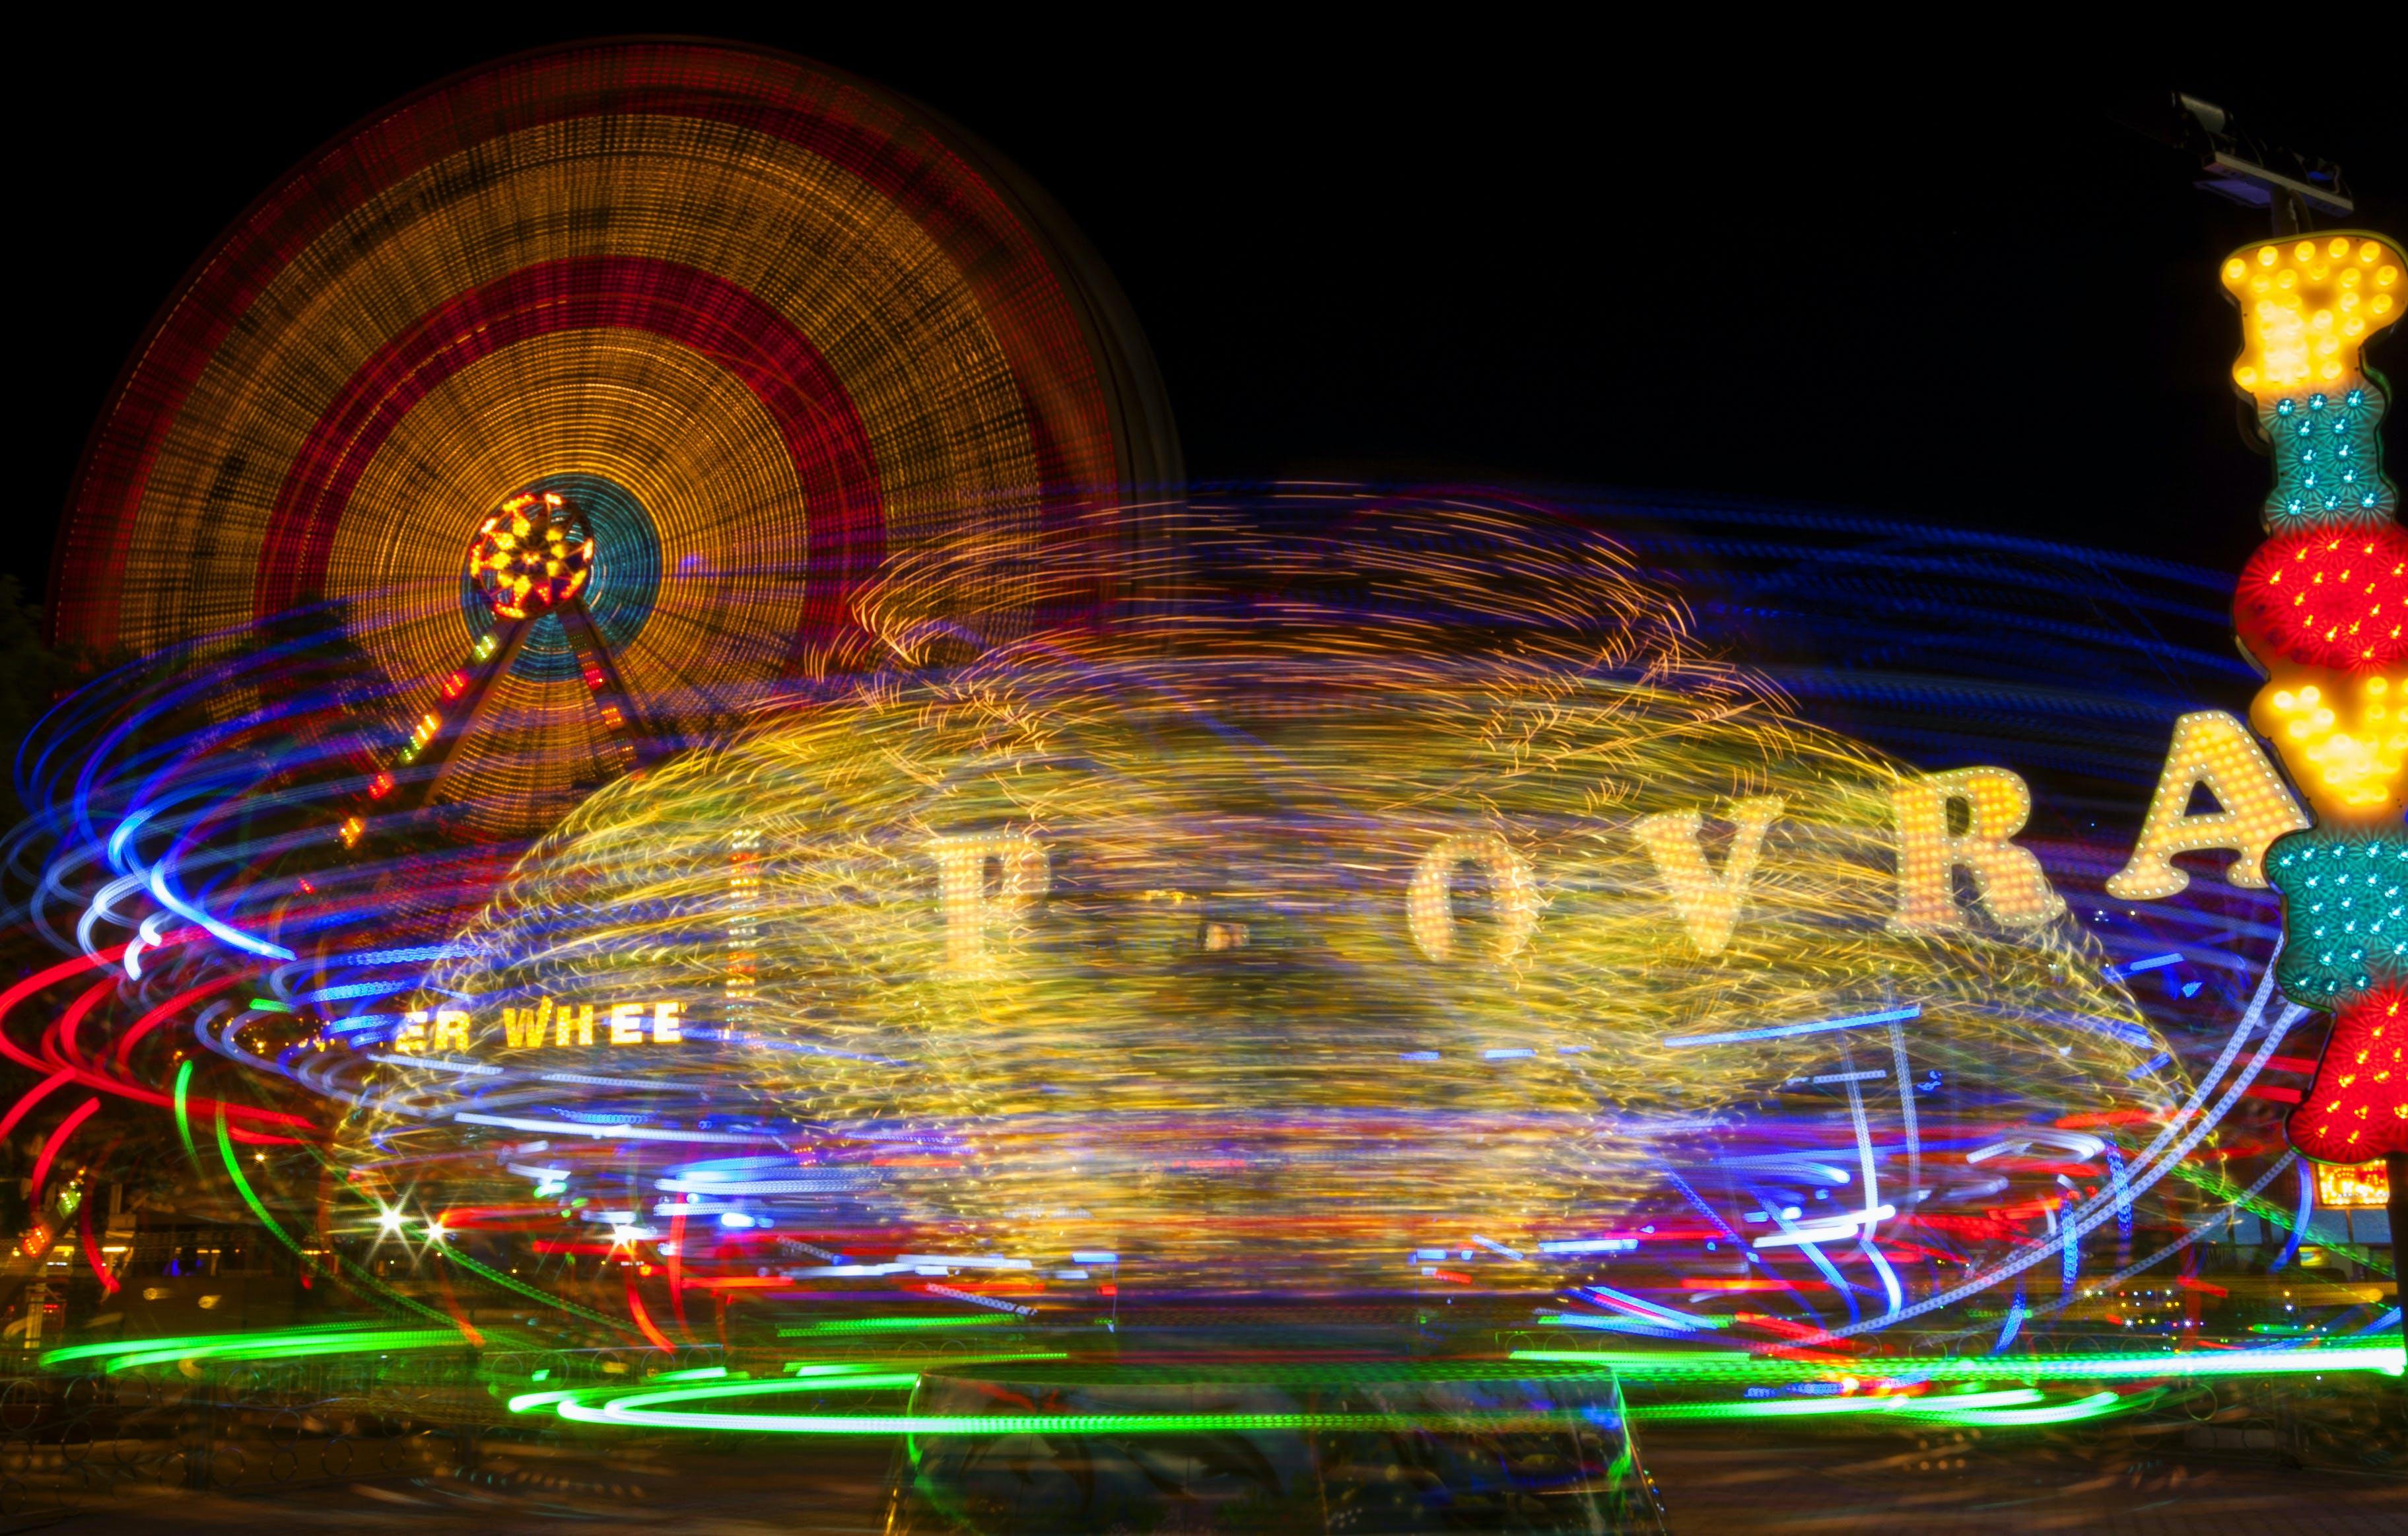 Free stock photo of night, summer, motion, amusement park